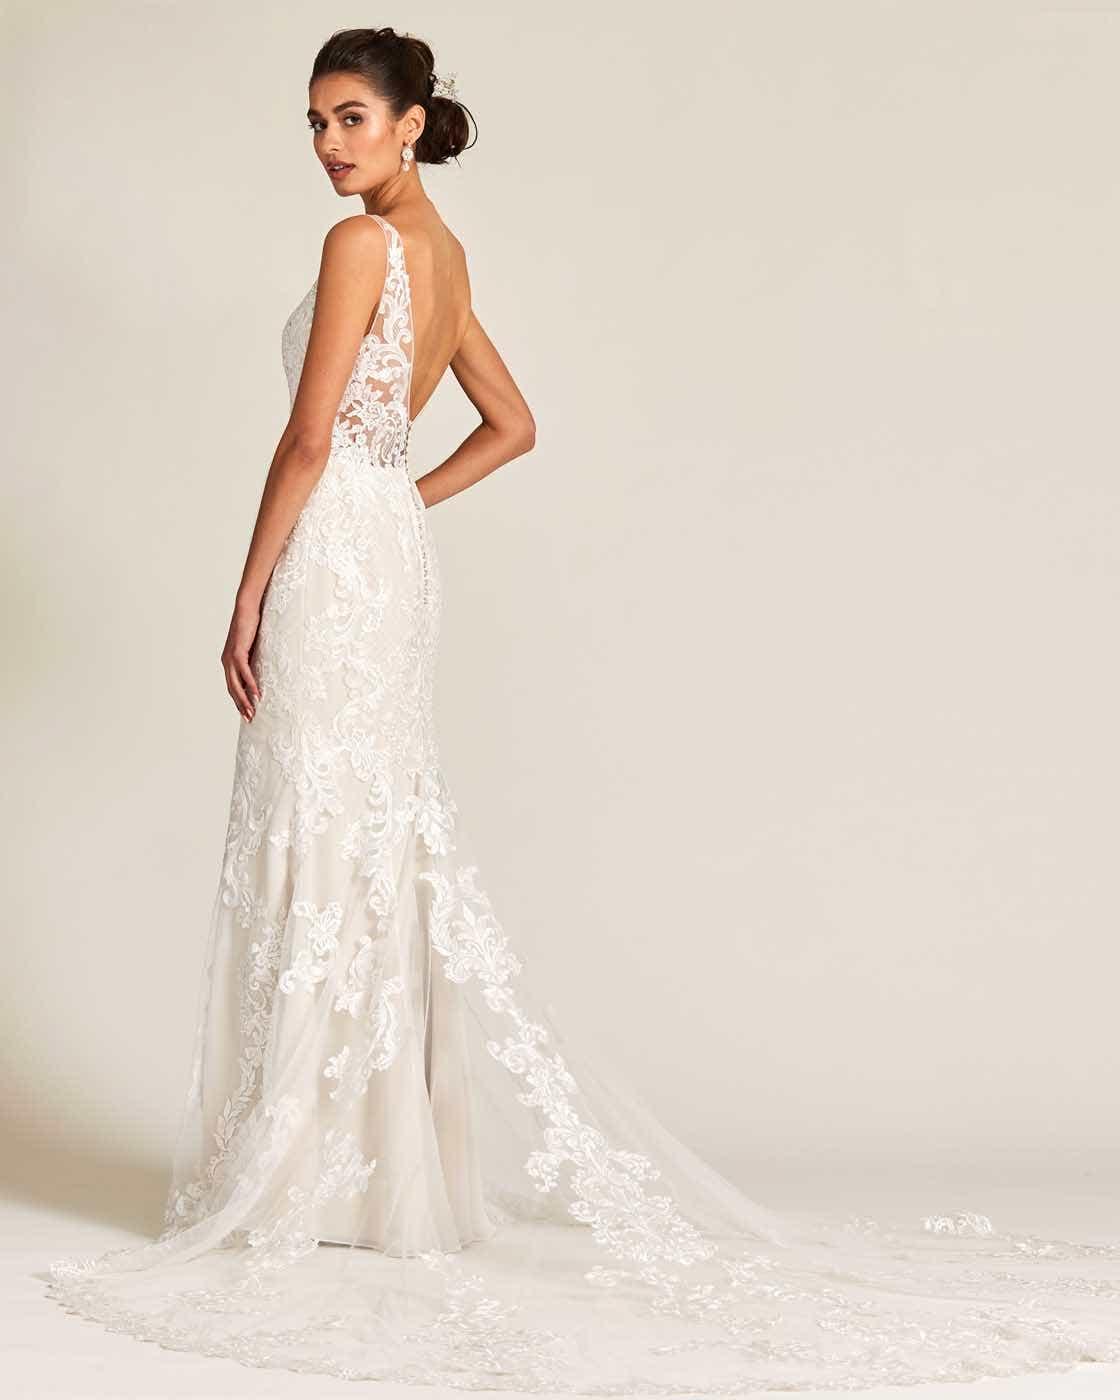 Vintage Style White Applique Wedding Gown - Detail Back